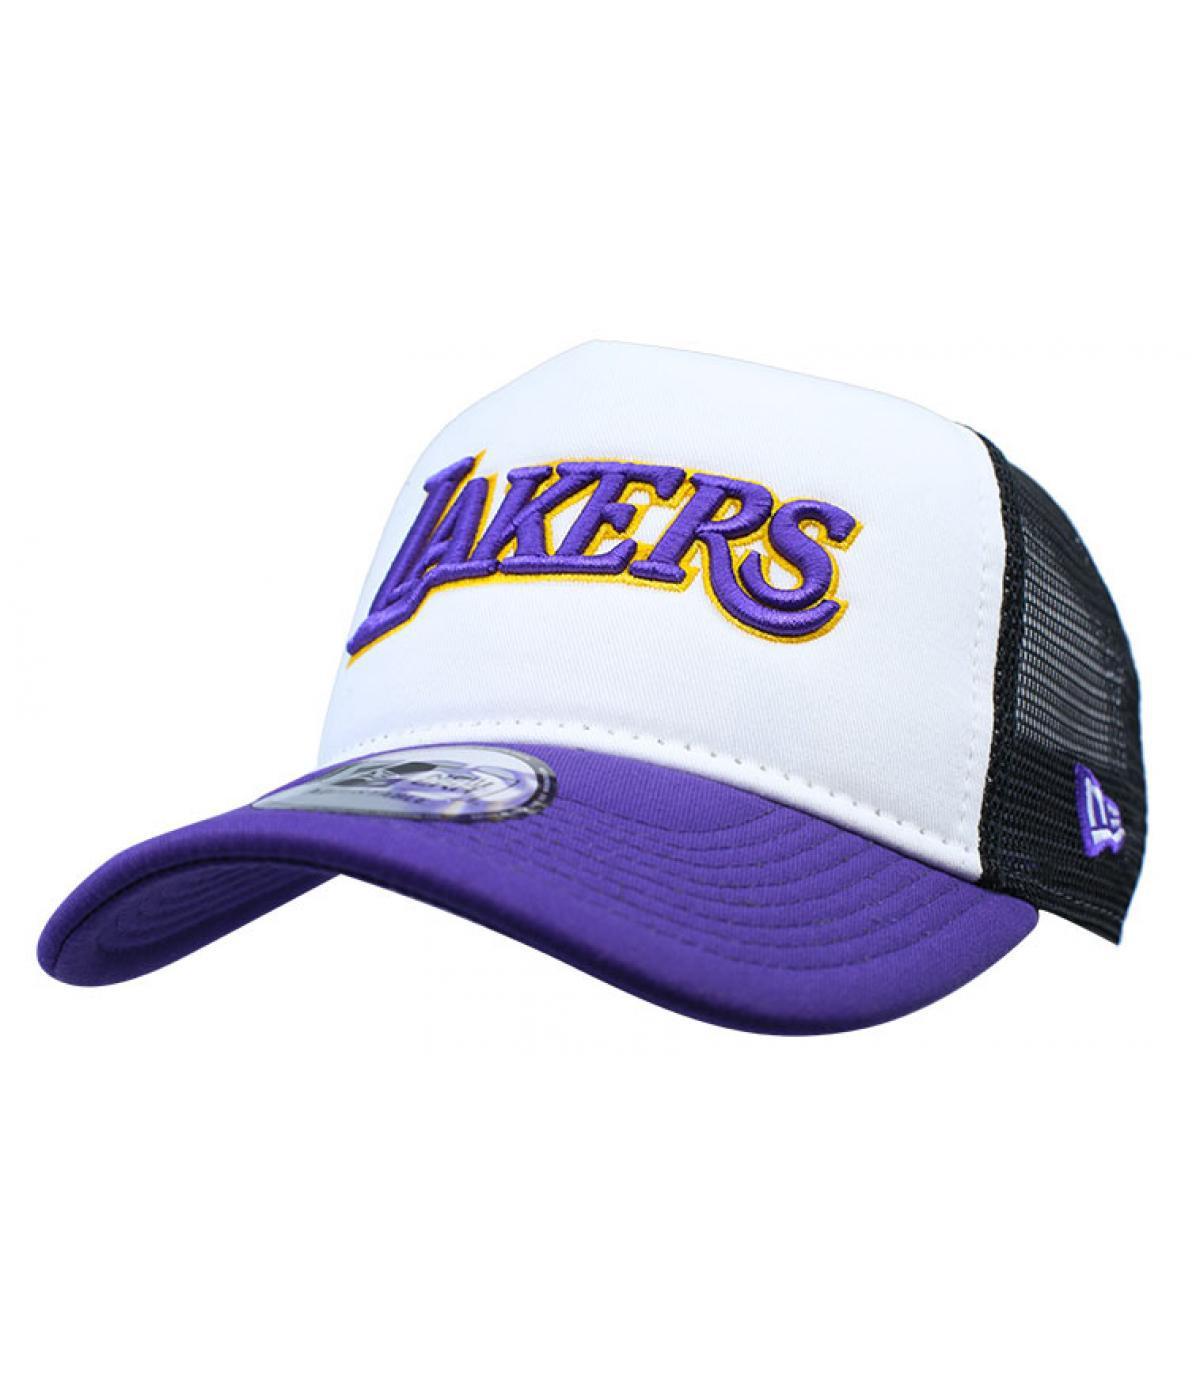 Details Trucker Lakers Color Block - afbeeling 2